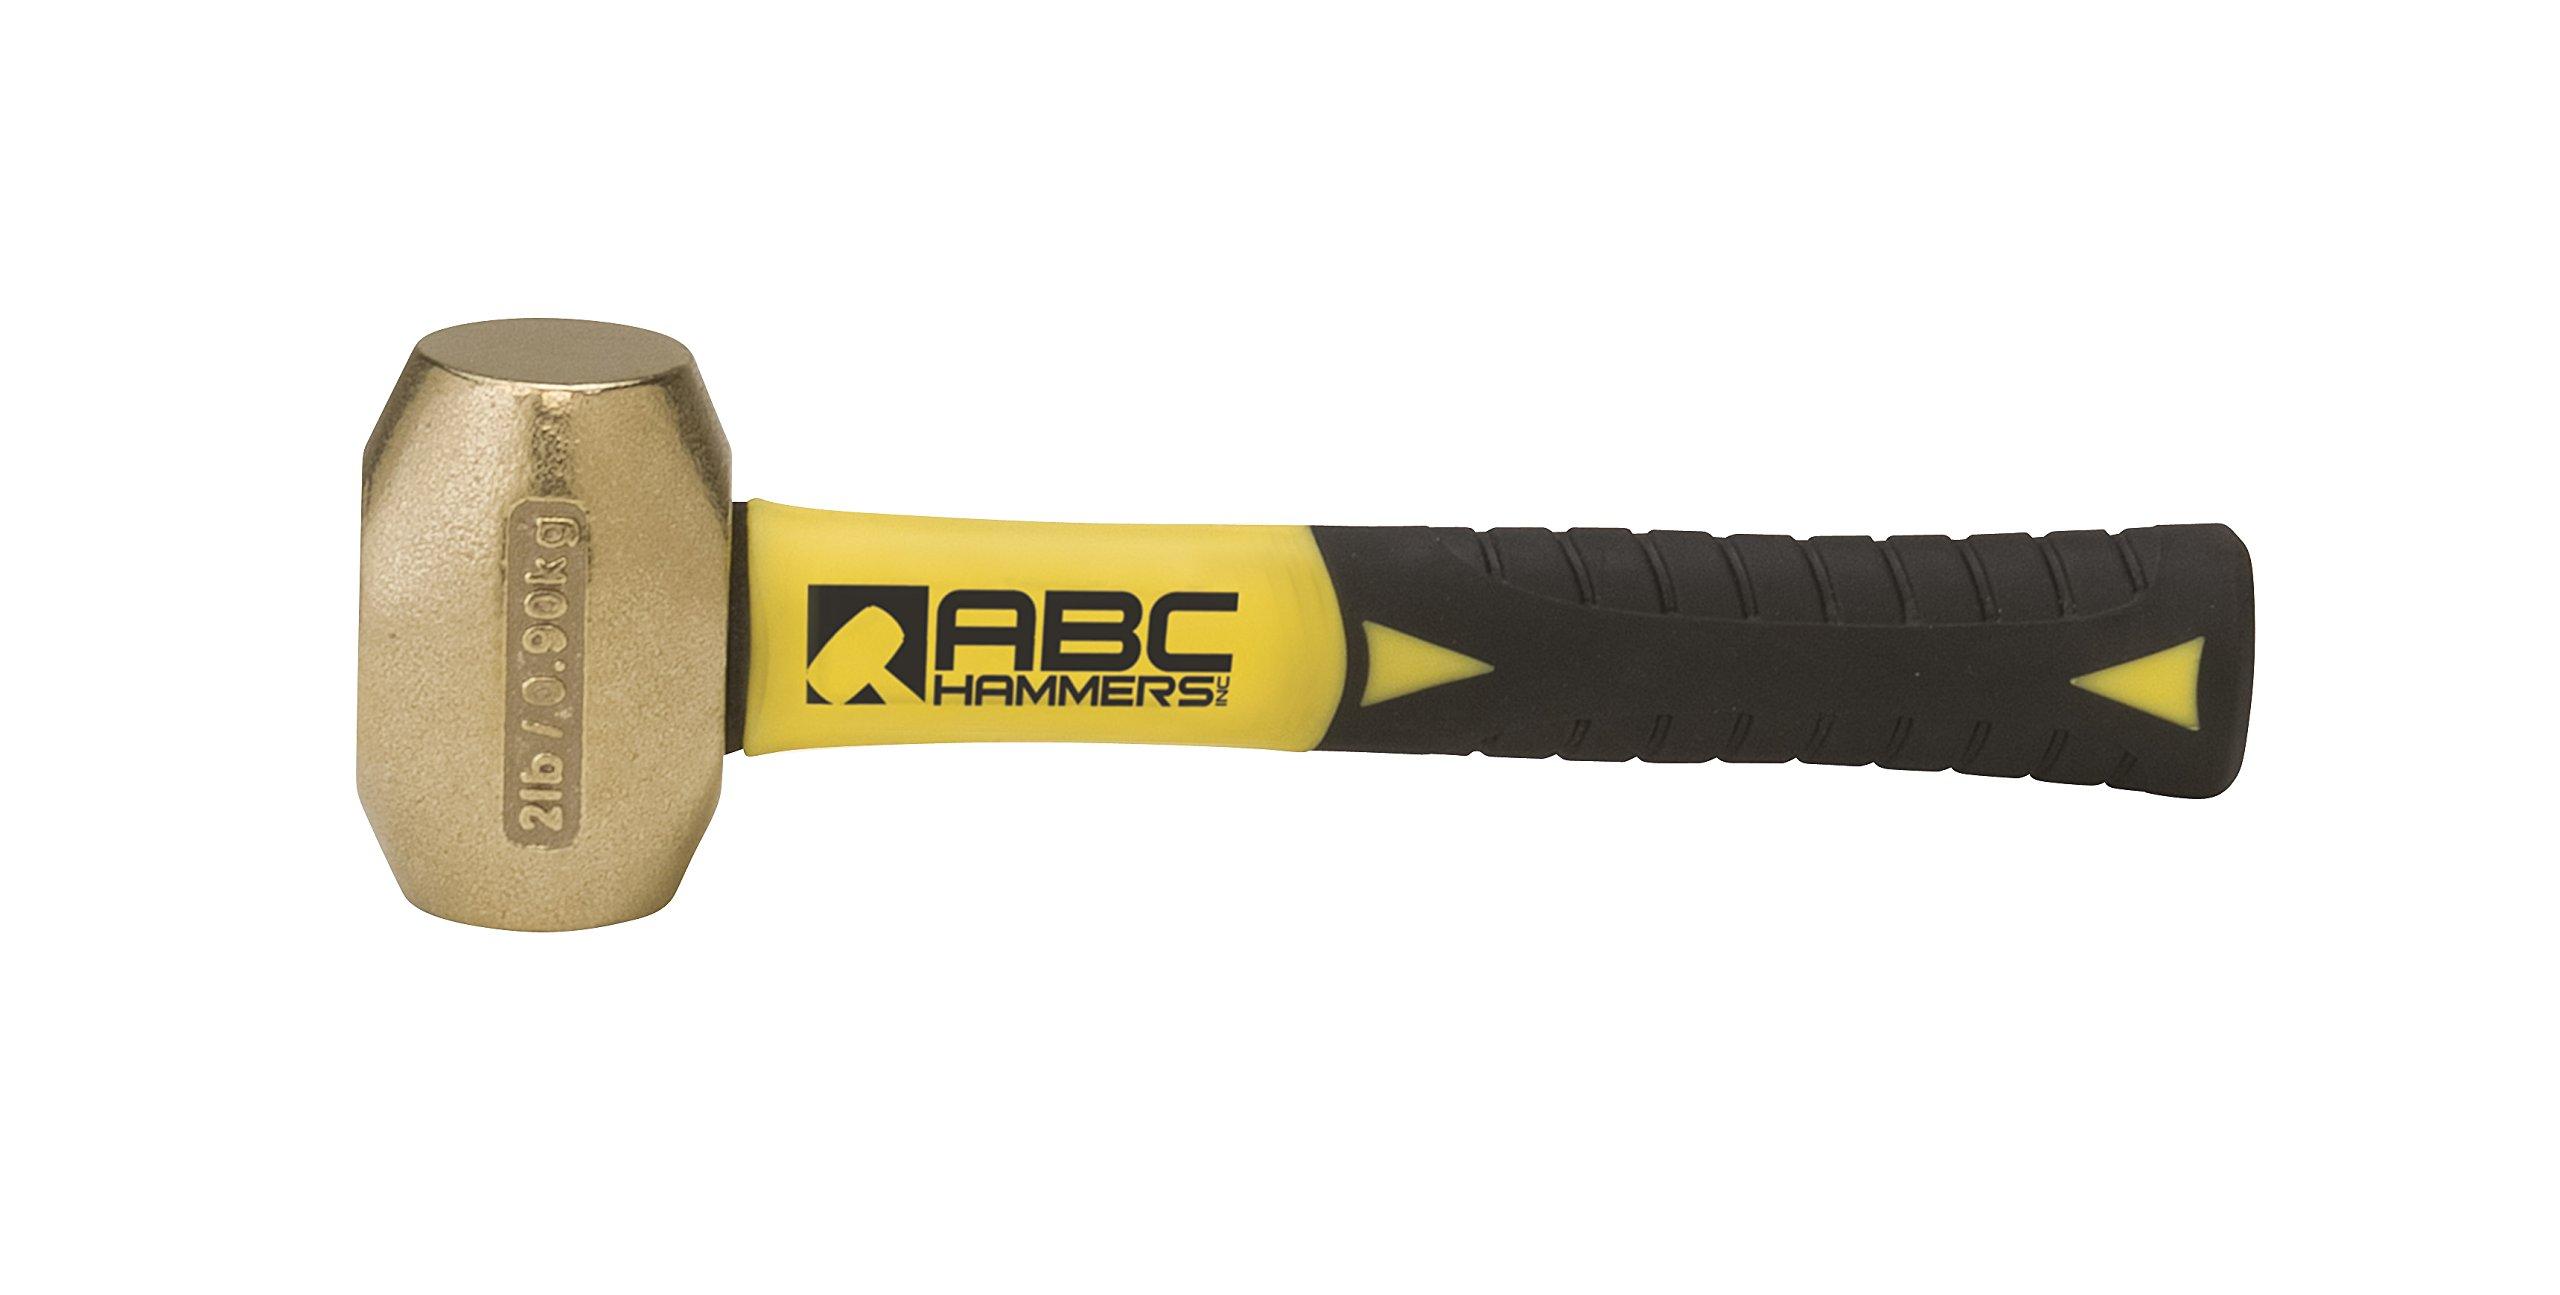 ABC Hammers ABC2BFS Brass Hammer with 8-Inch Fiberglass Handle, 2-Pound